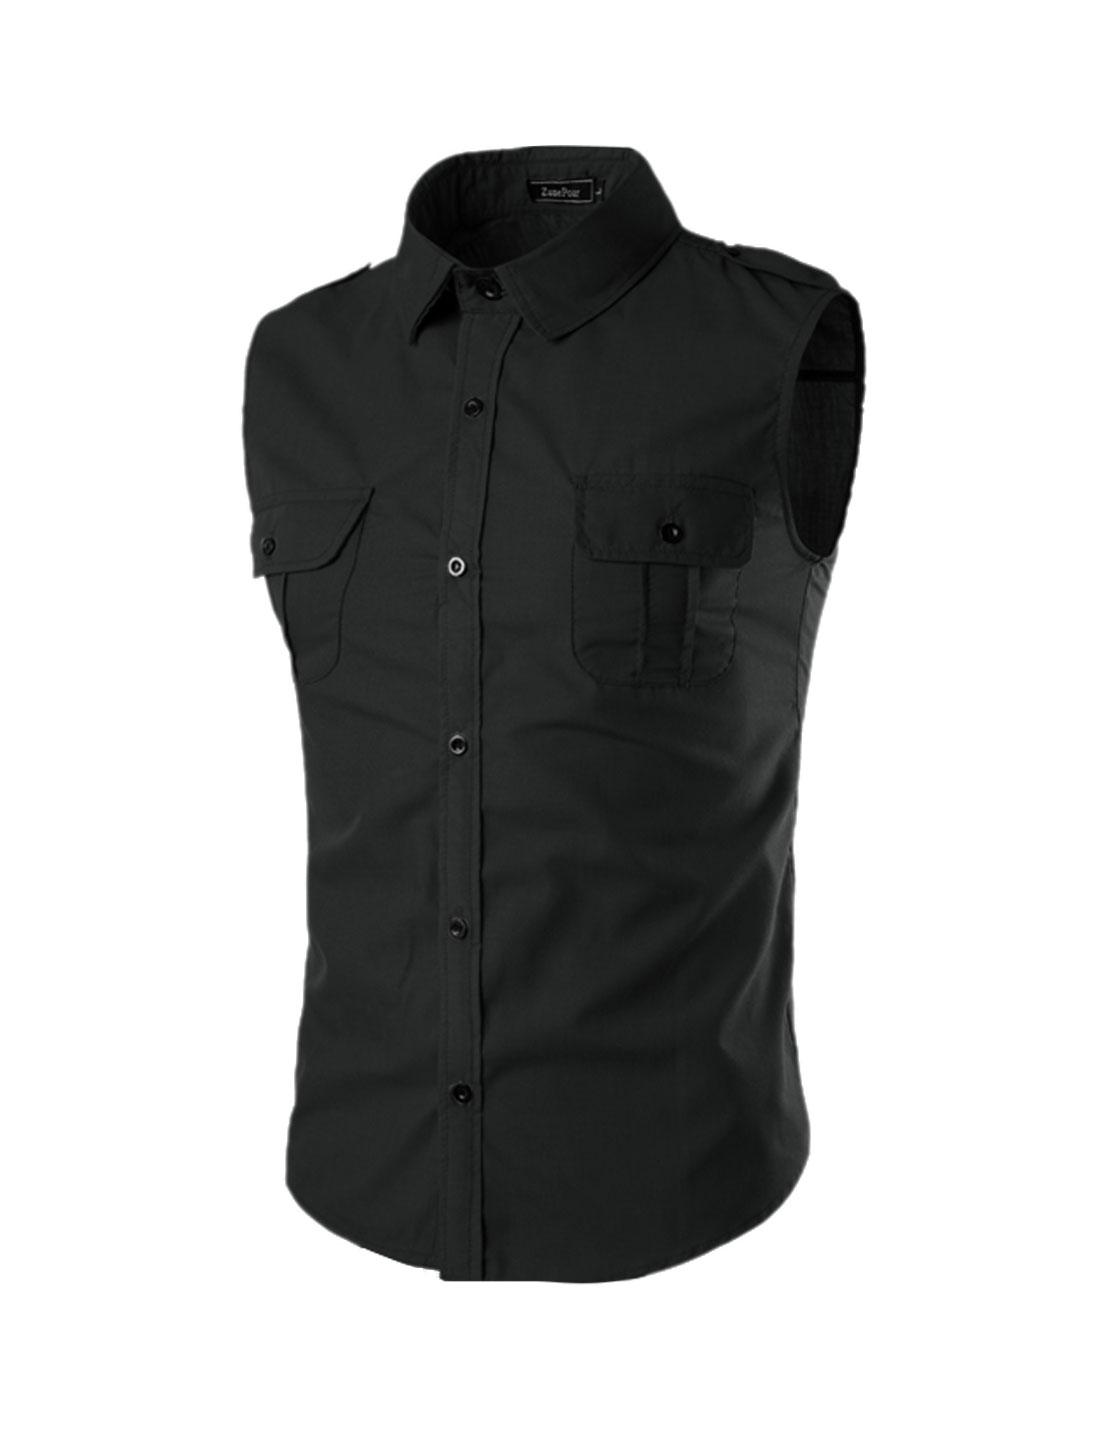 Men Flap Chest Pocket Button Closure Sleeveless Shirt Black M